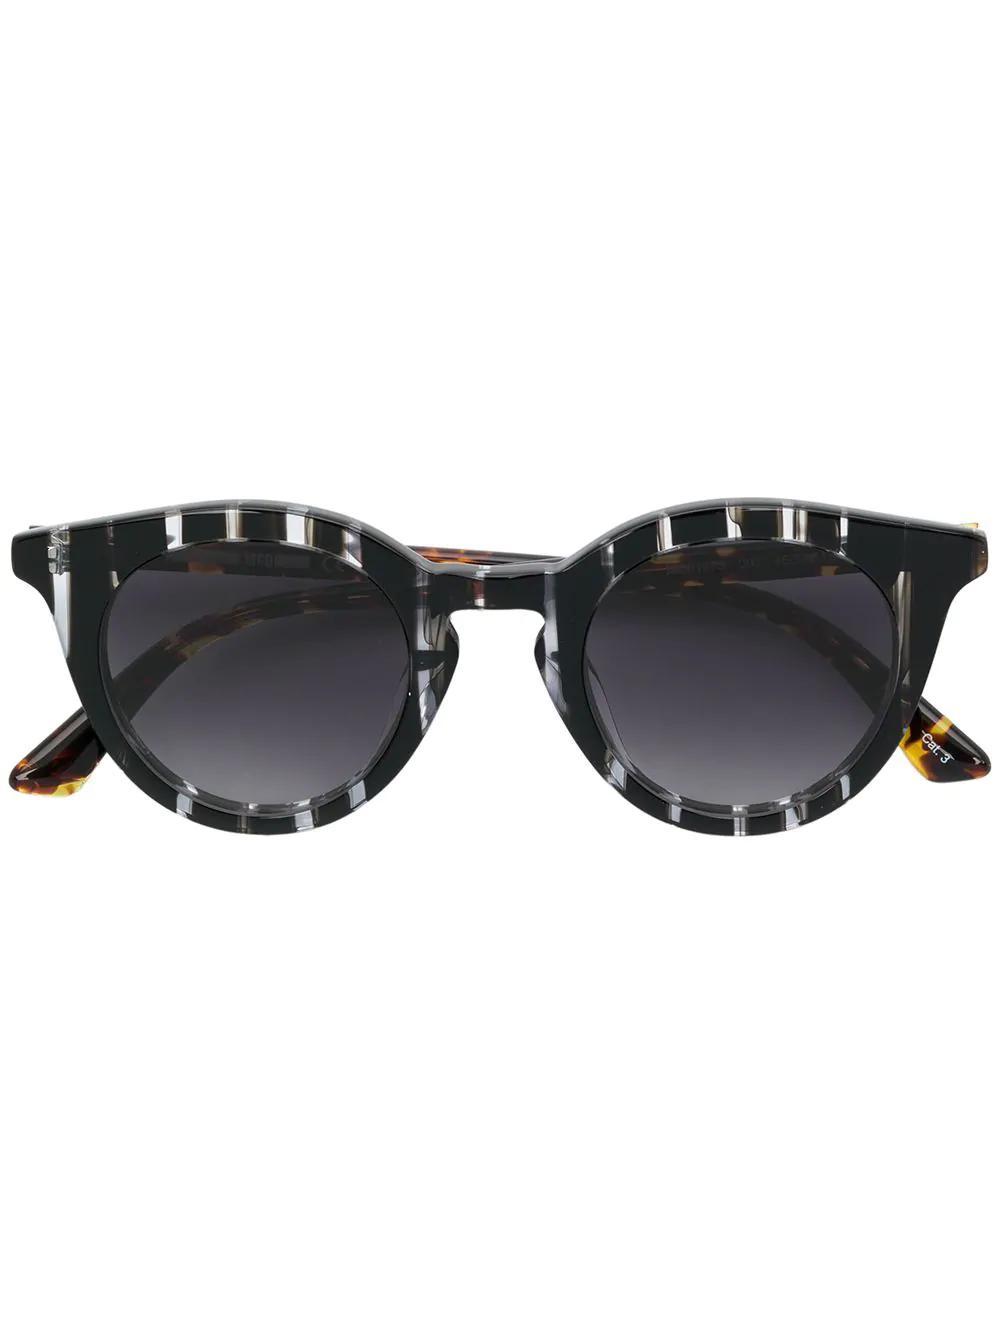 a35592dbed9d Mcq By Alexander Mcqueen Mcq Alexander Mcqueen Round Sunglasses - Black